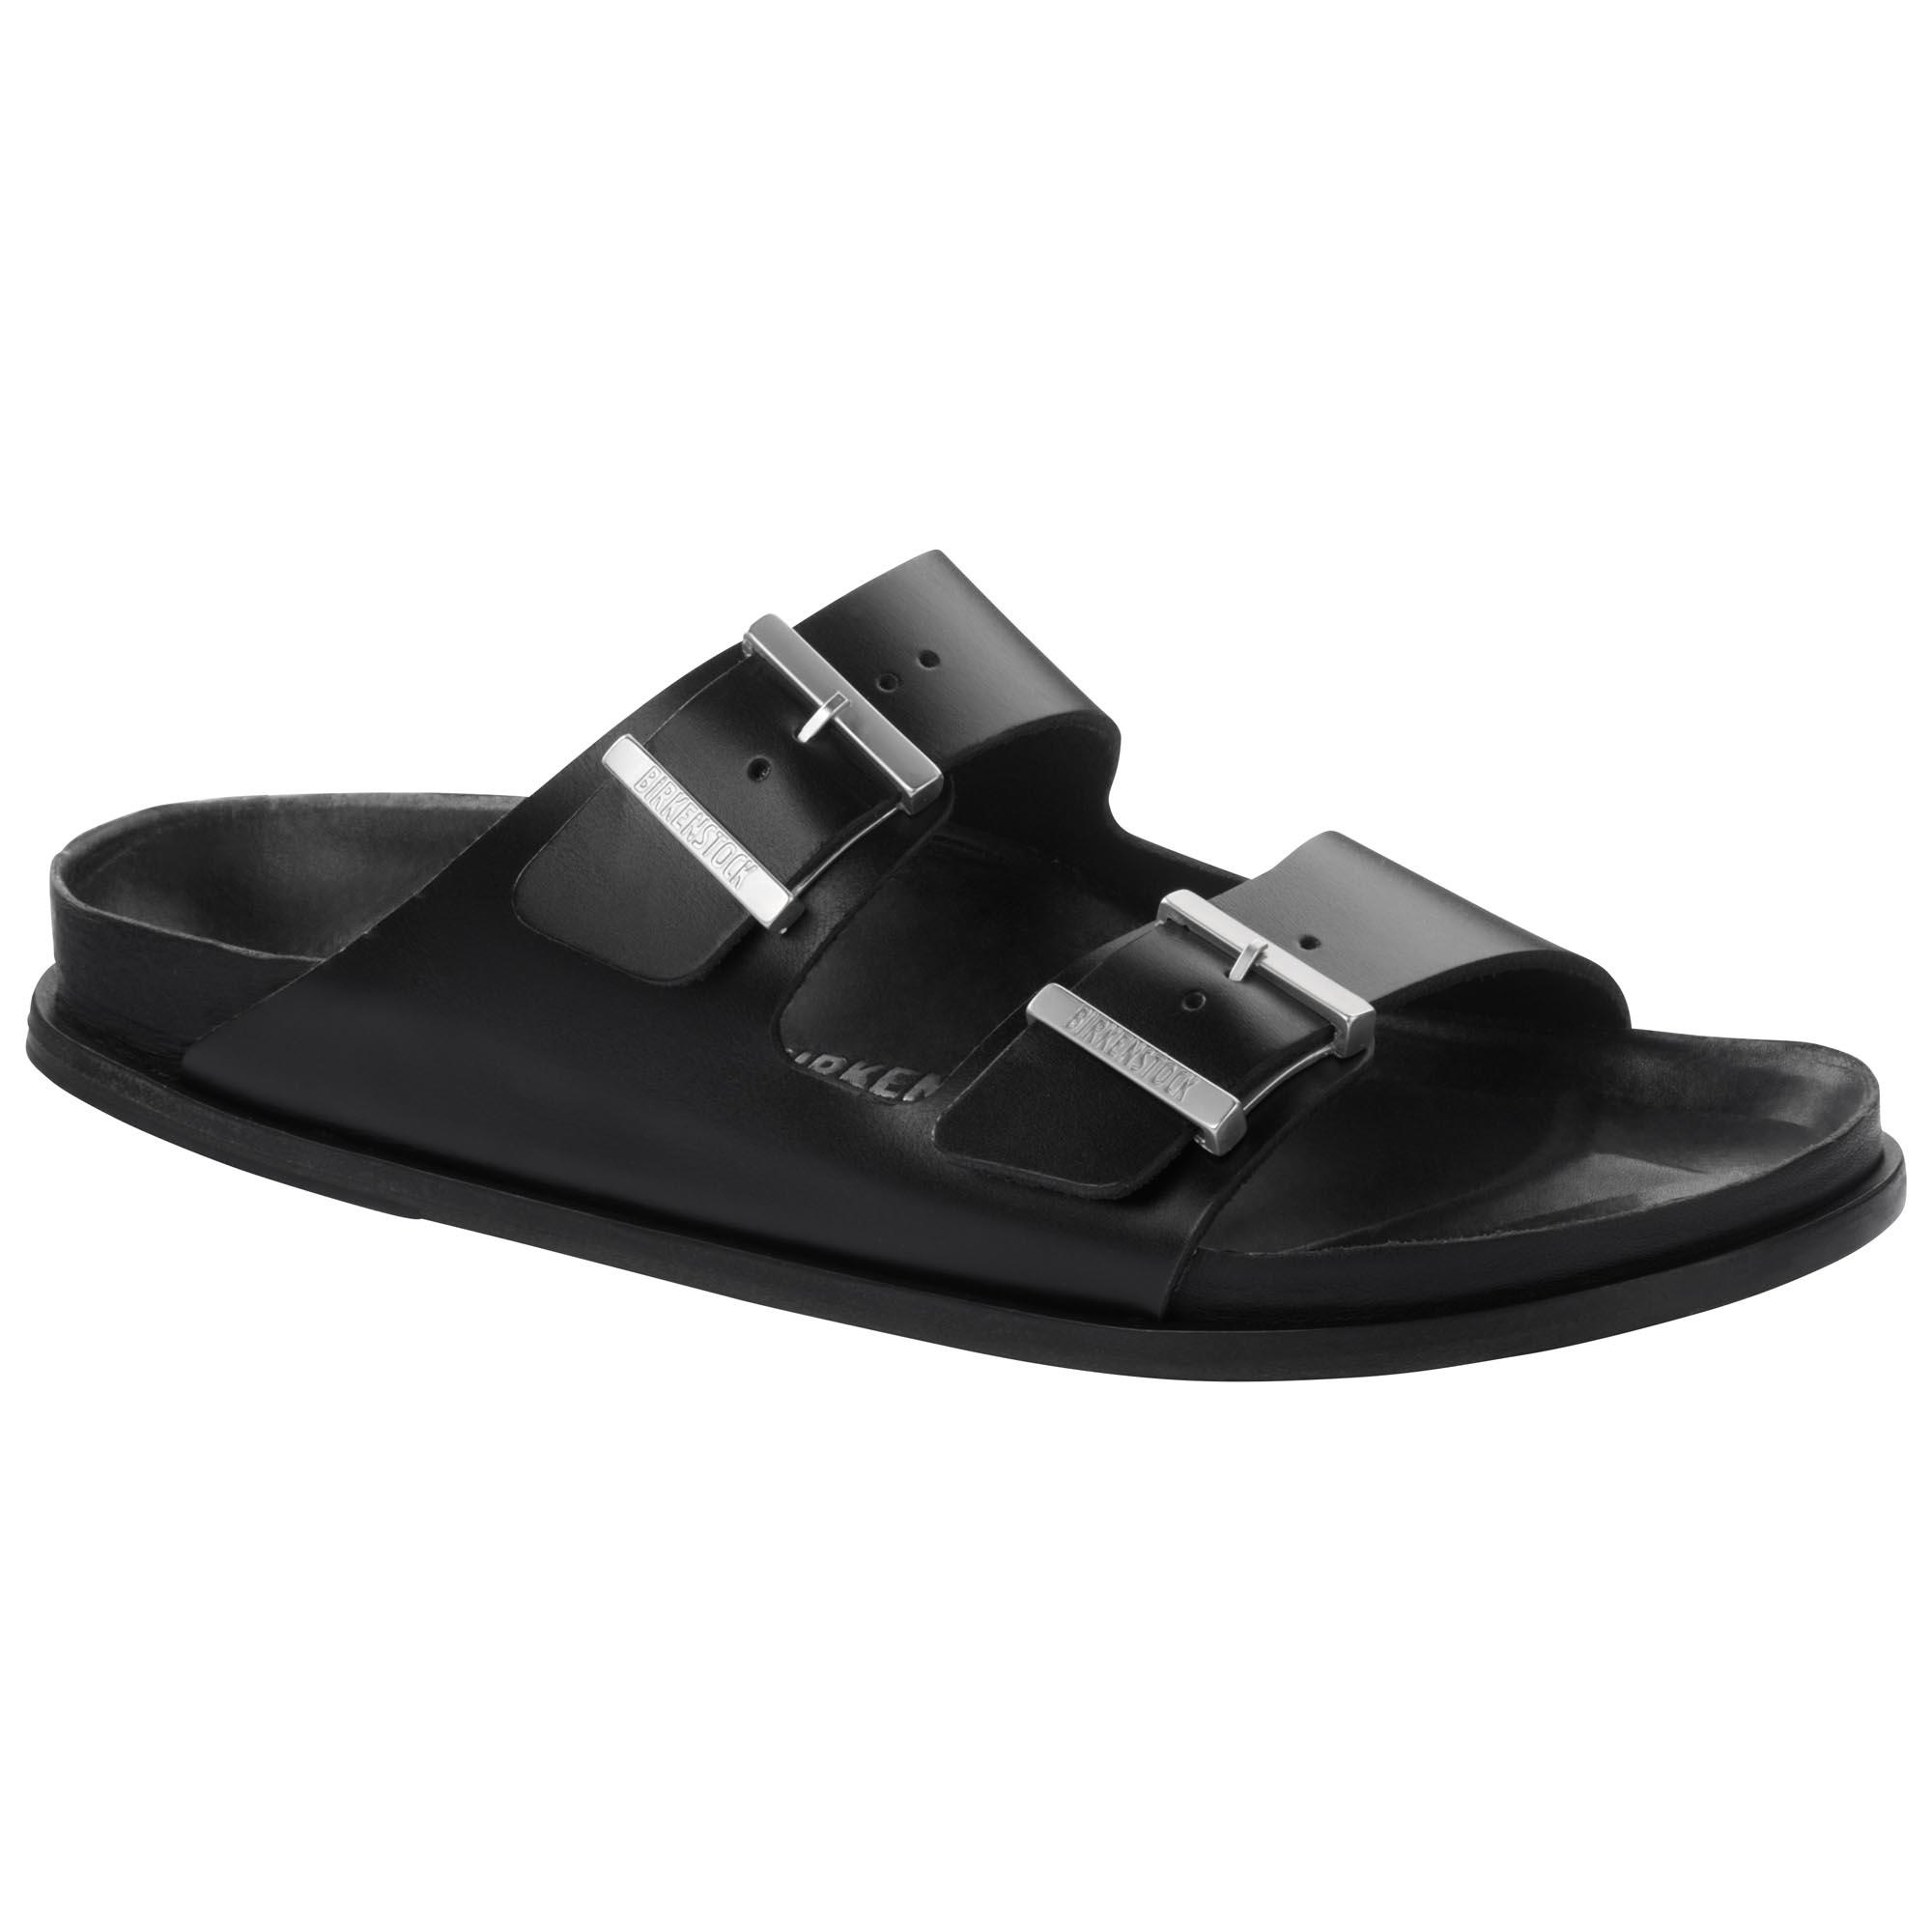 a66a5789fd3 Arizona Natural Leather Premium Black ...